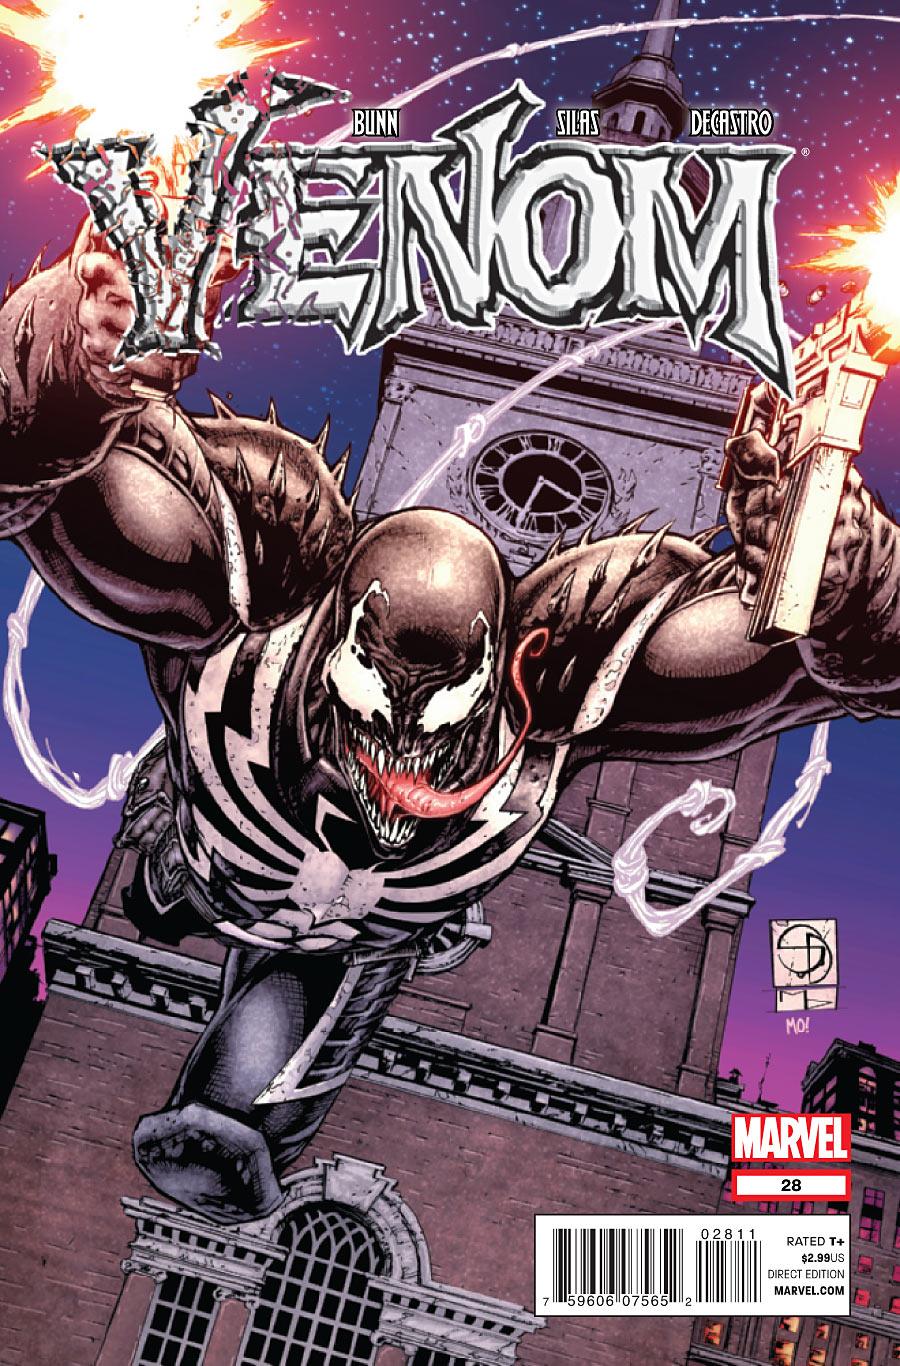 Venom Vol 2 28